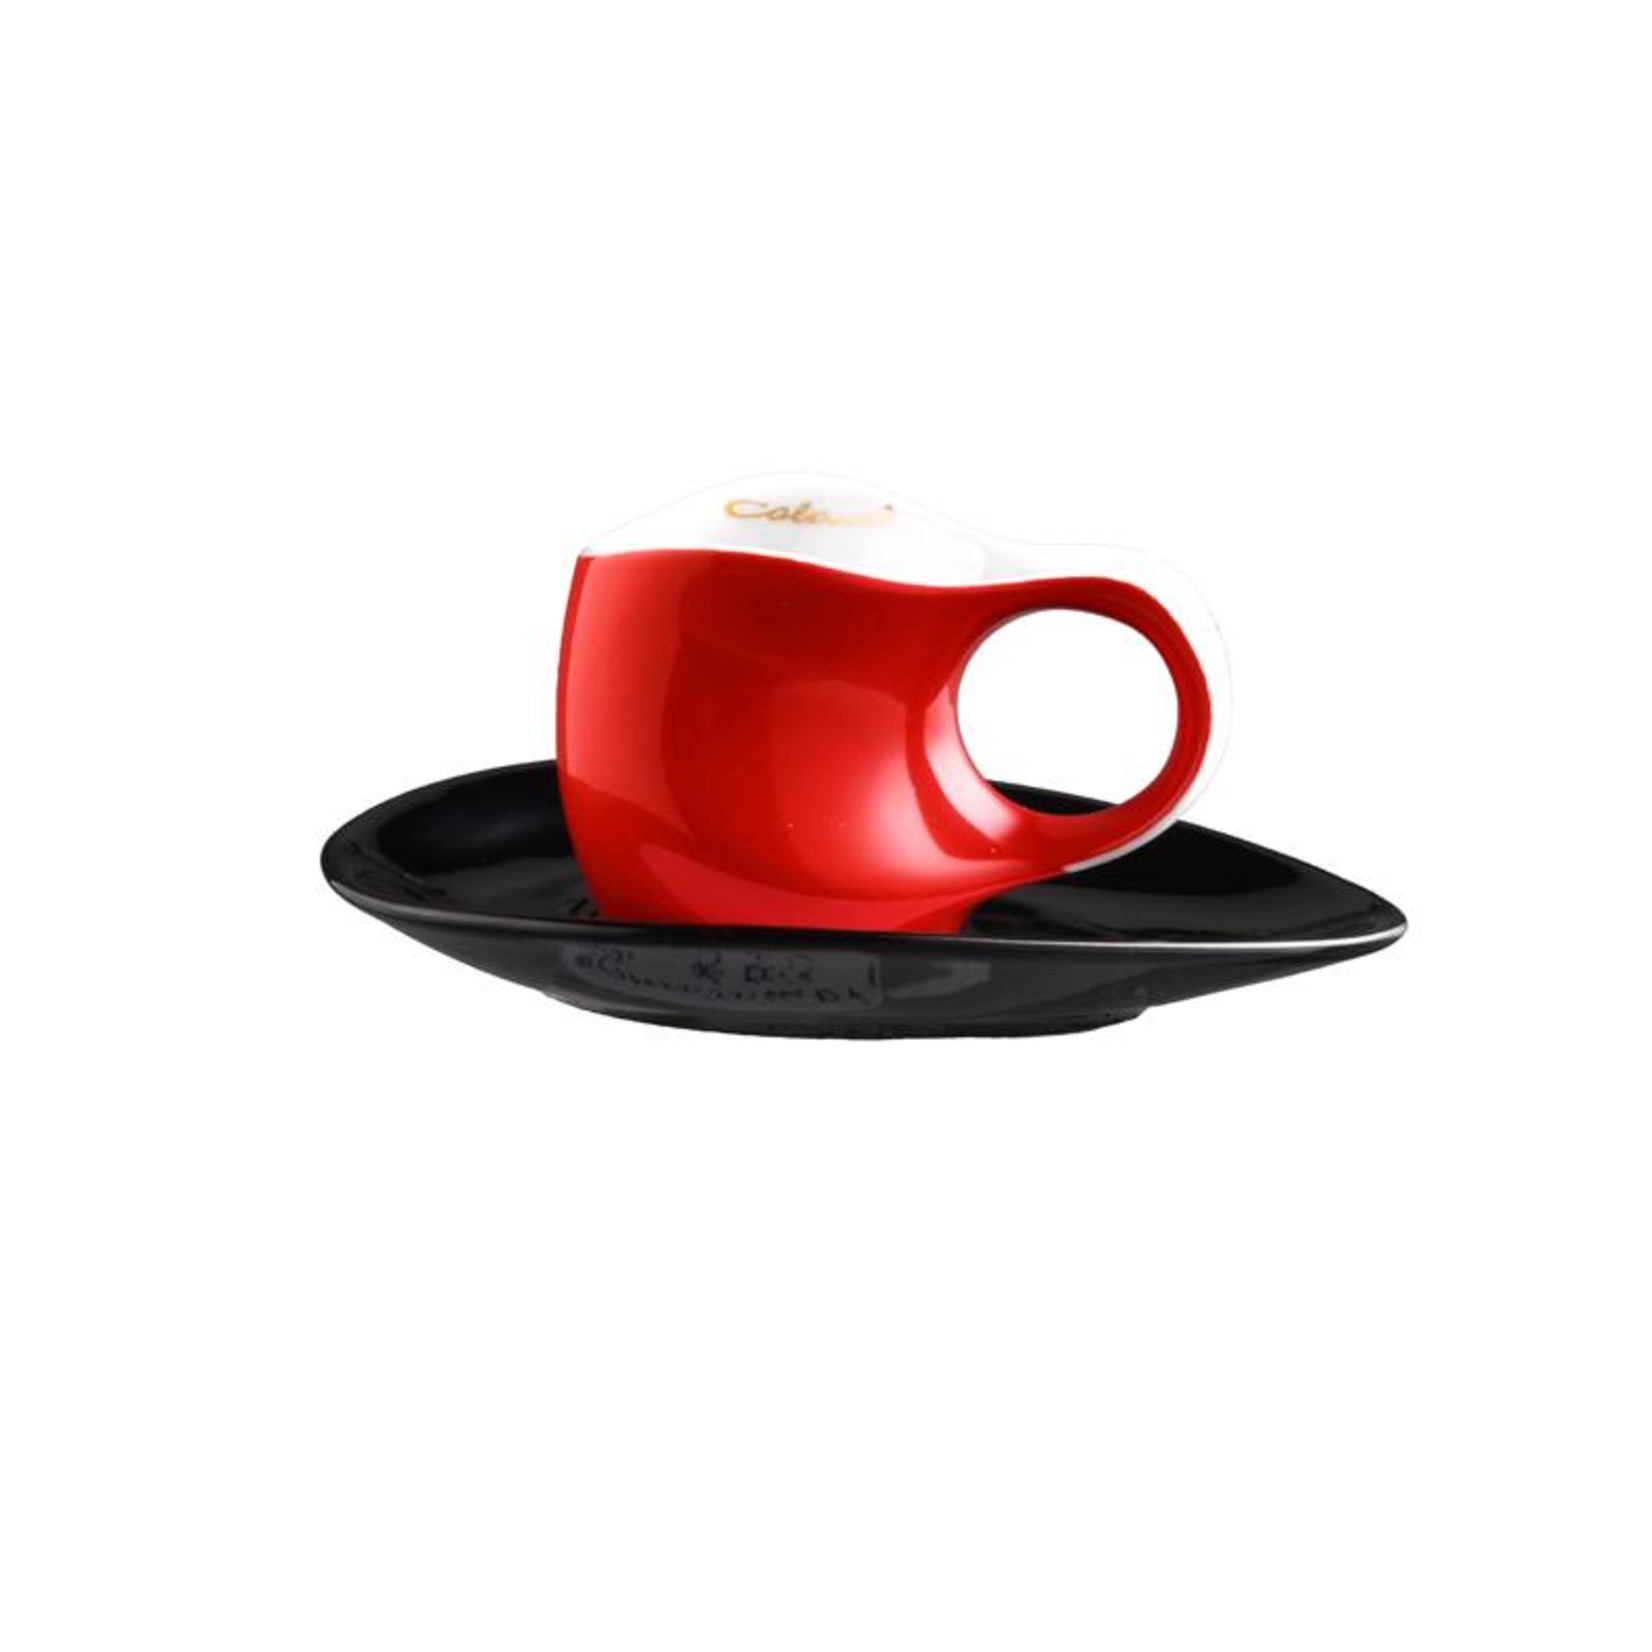 Colani Porzellanserie Colani Espressotasse 2- teilig in Rot